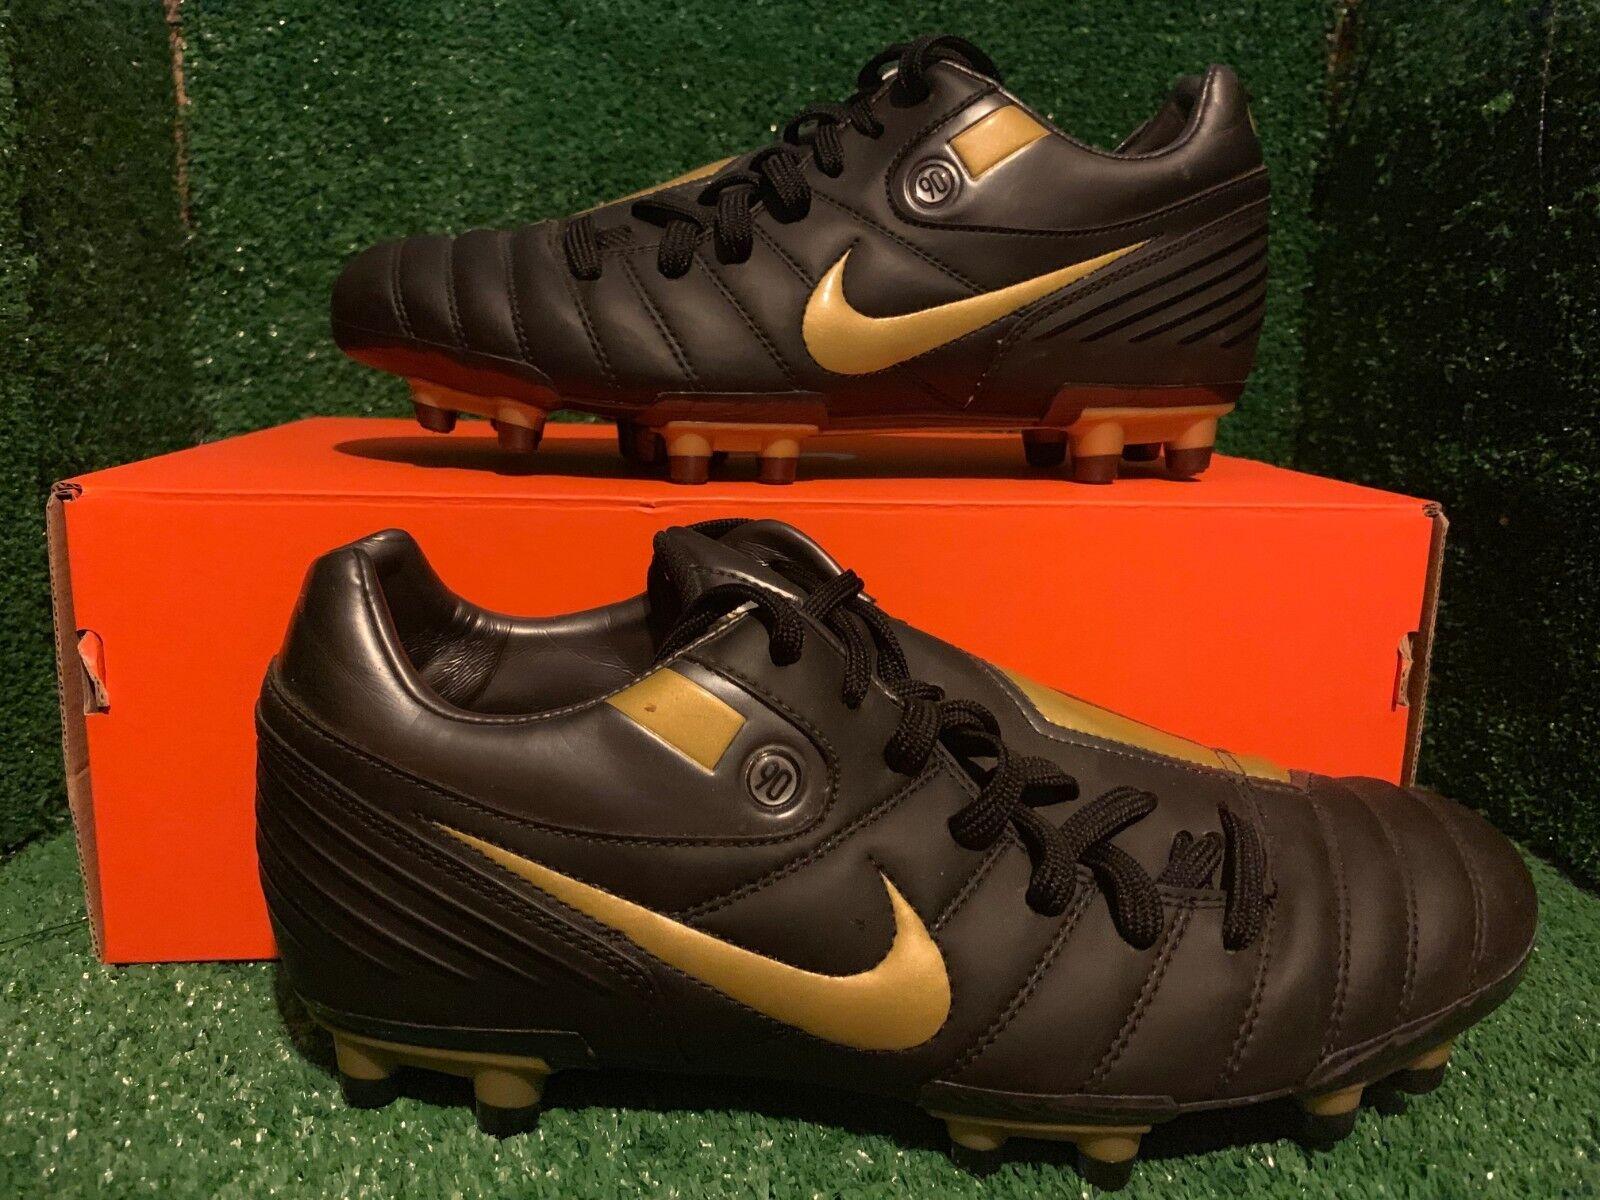 Nike Air Zoom Total 90 I Fg supremacía Botines De Fútbol 8,5 7,5 42